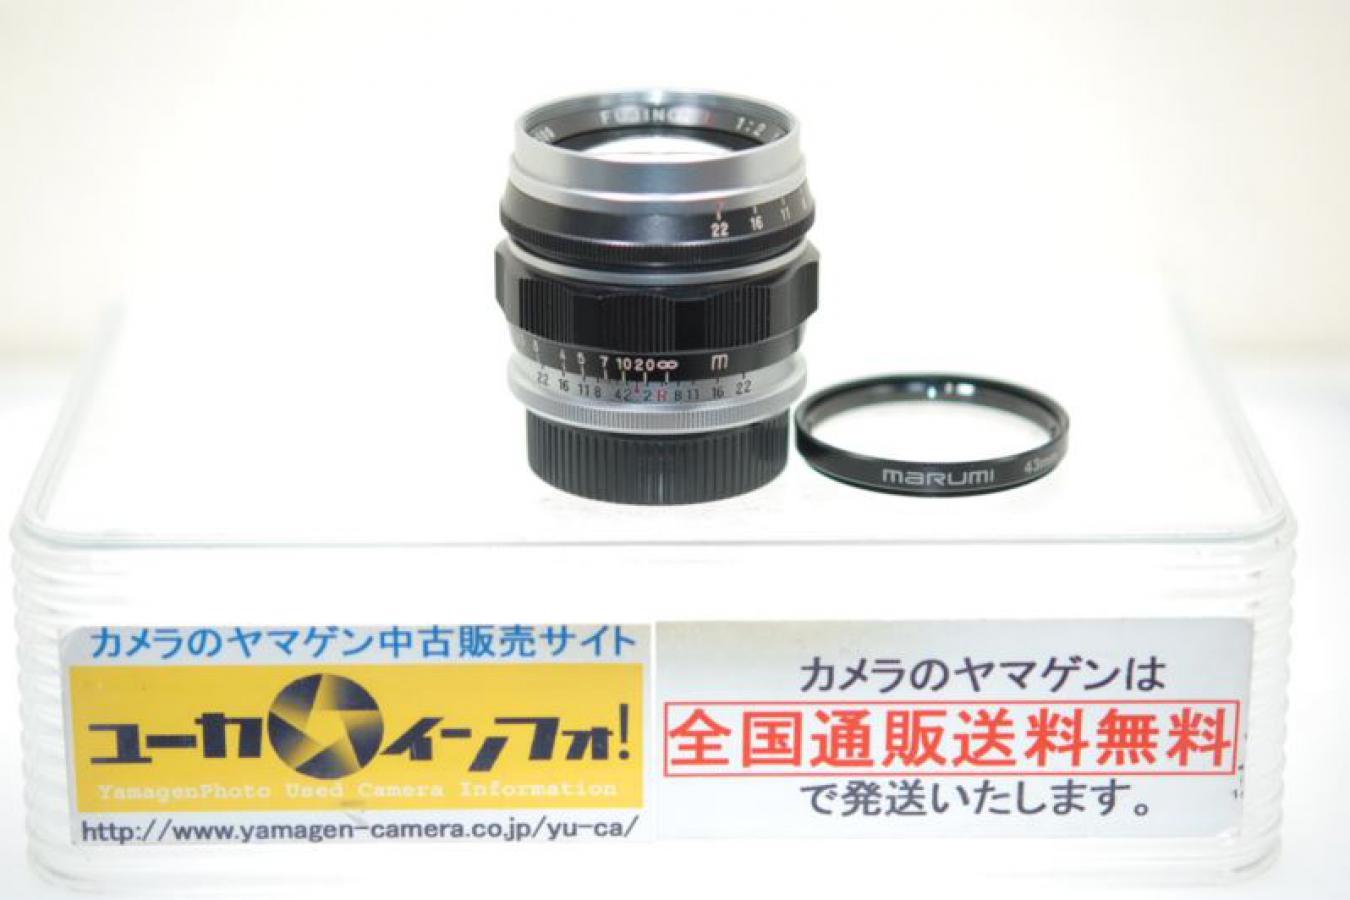 FUJINON L 5cm F2 マルミ製43mmMC-UVフィルター付 【ライカLマウントレンズ】